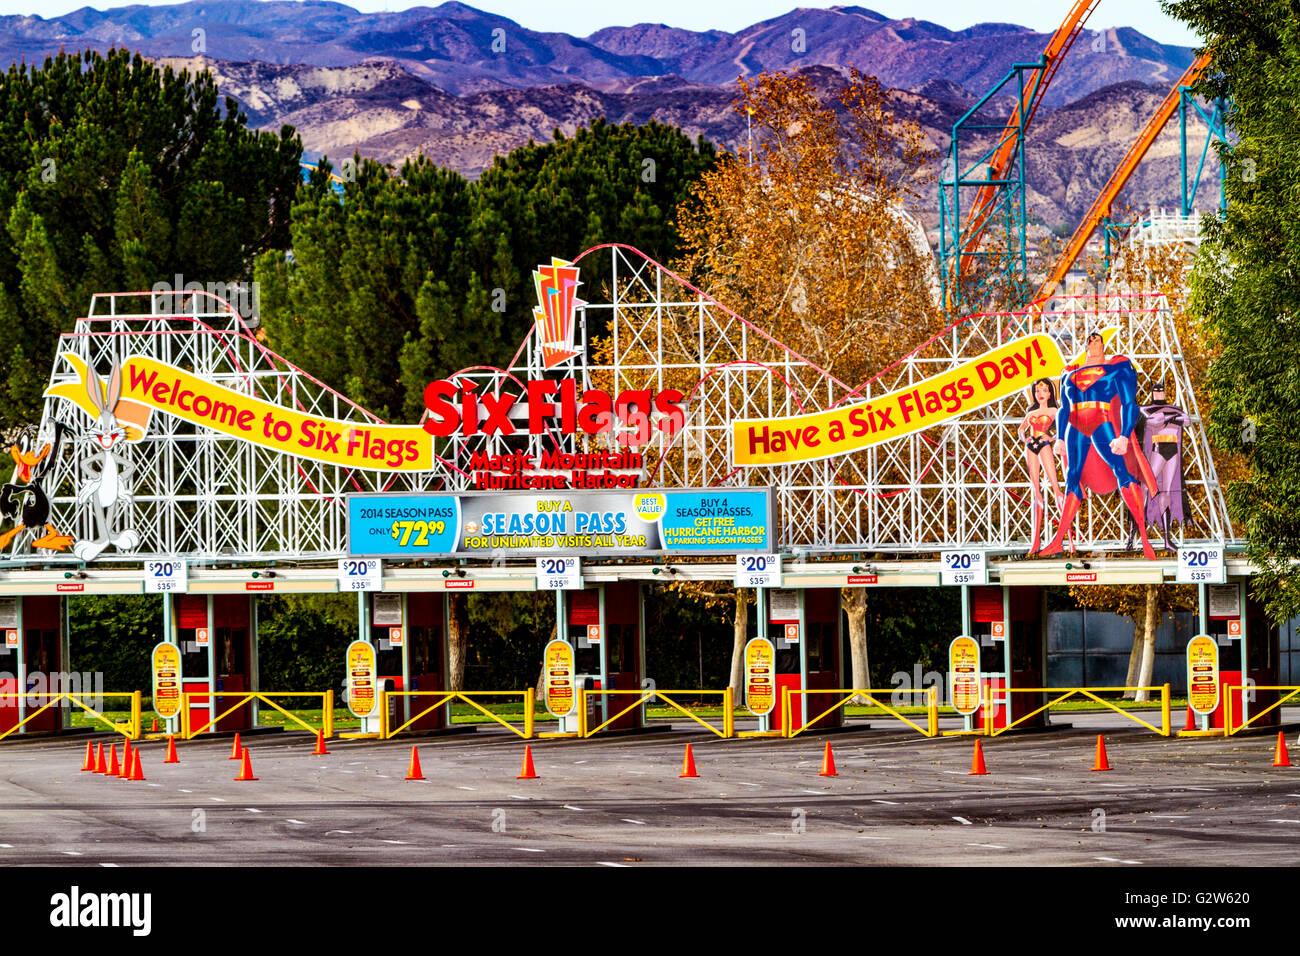 The entrance to Six Flags Magic Mountain in Santa Clarita California Stock Photo